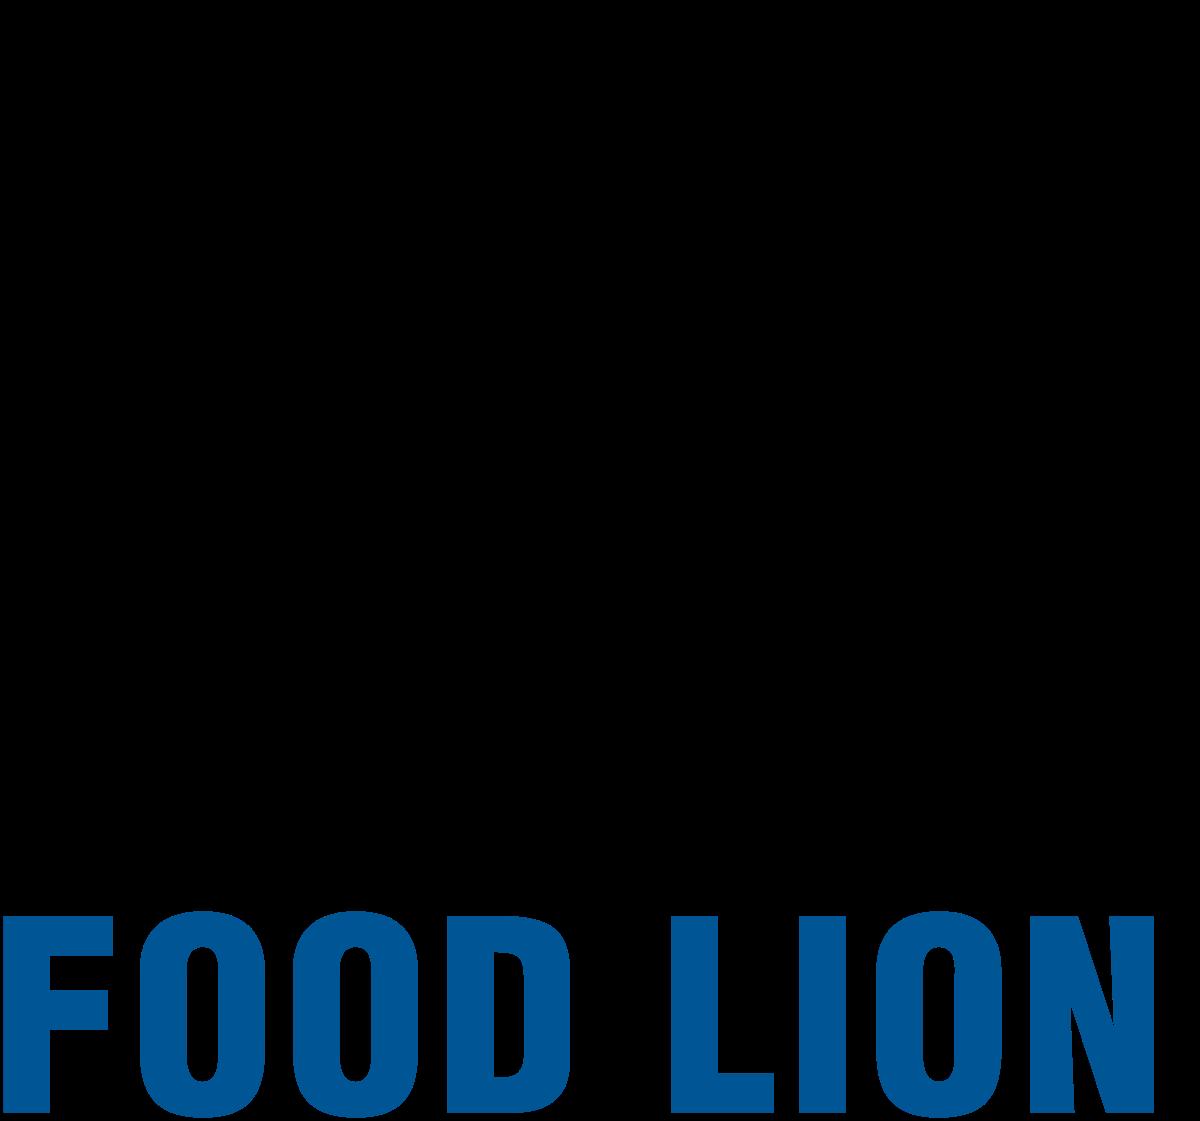 Food_Lion_The StratLab Client.png